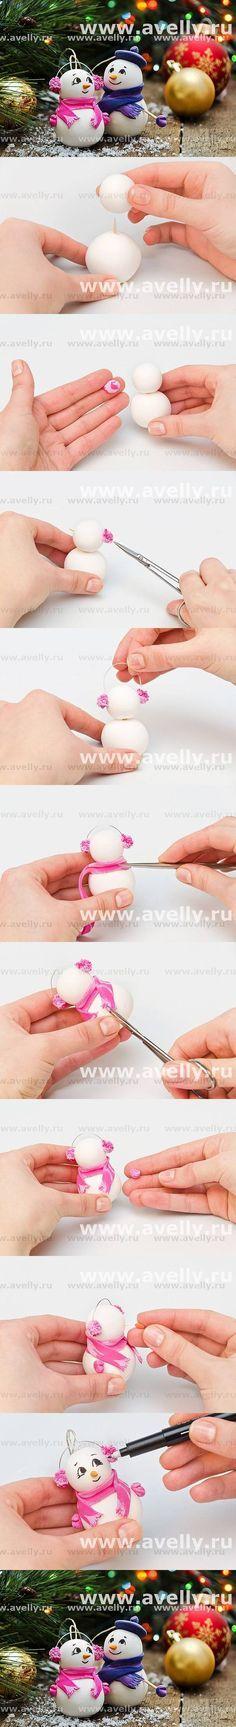 DIY Christmas Snowman DIY Projects | UsefulDIY.com Follow Us on Facebook ==> http://www.facebook.com/UsefulDiy